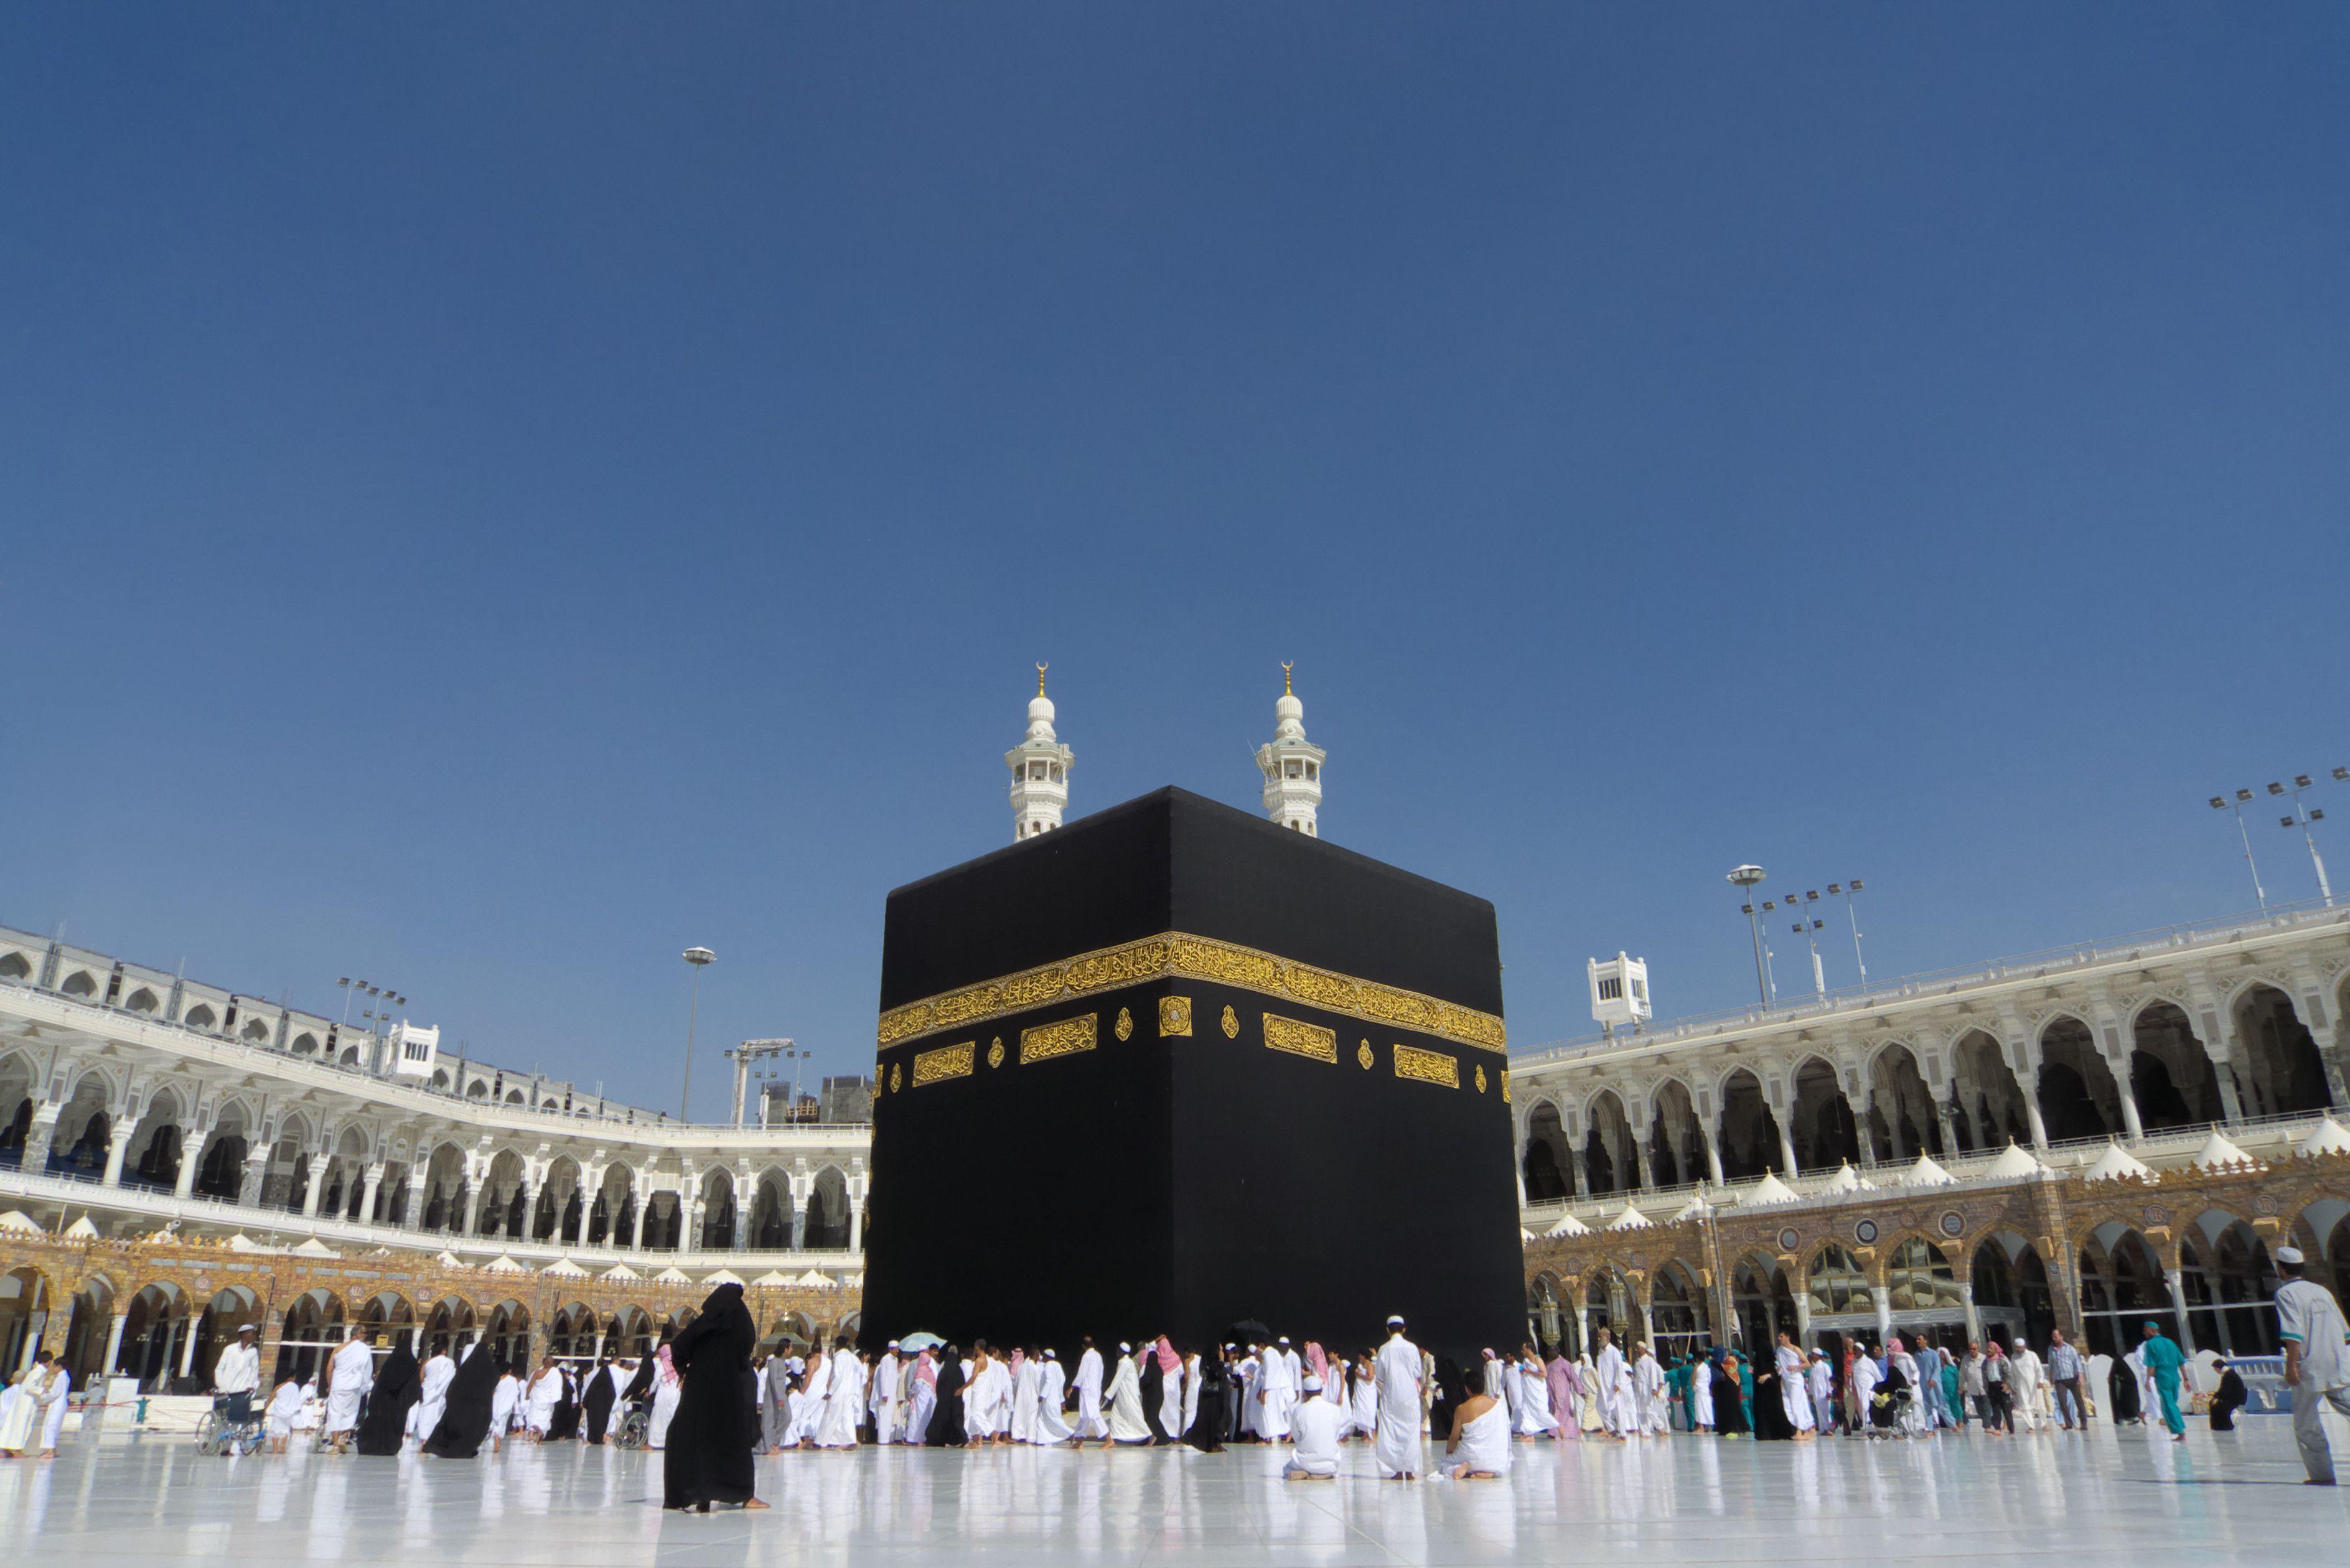 kaaba-mecca-wallpaper-roe | Template | Pilgrimage to mecca